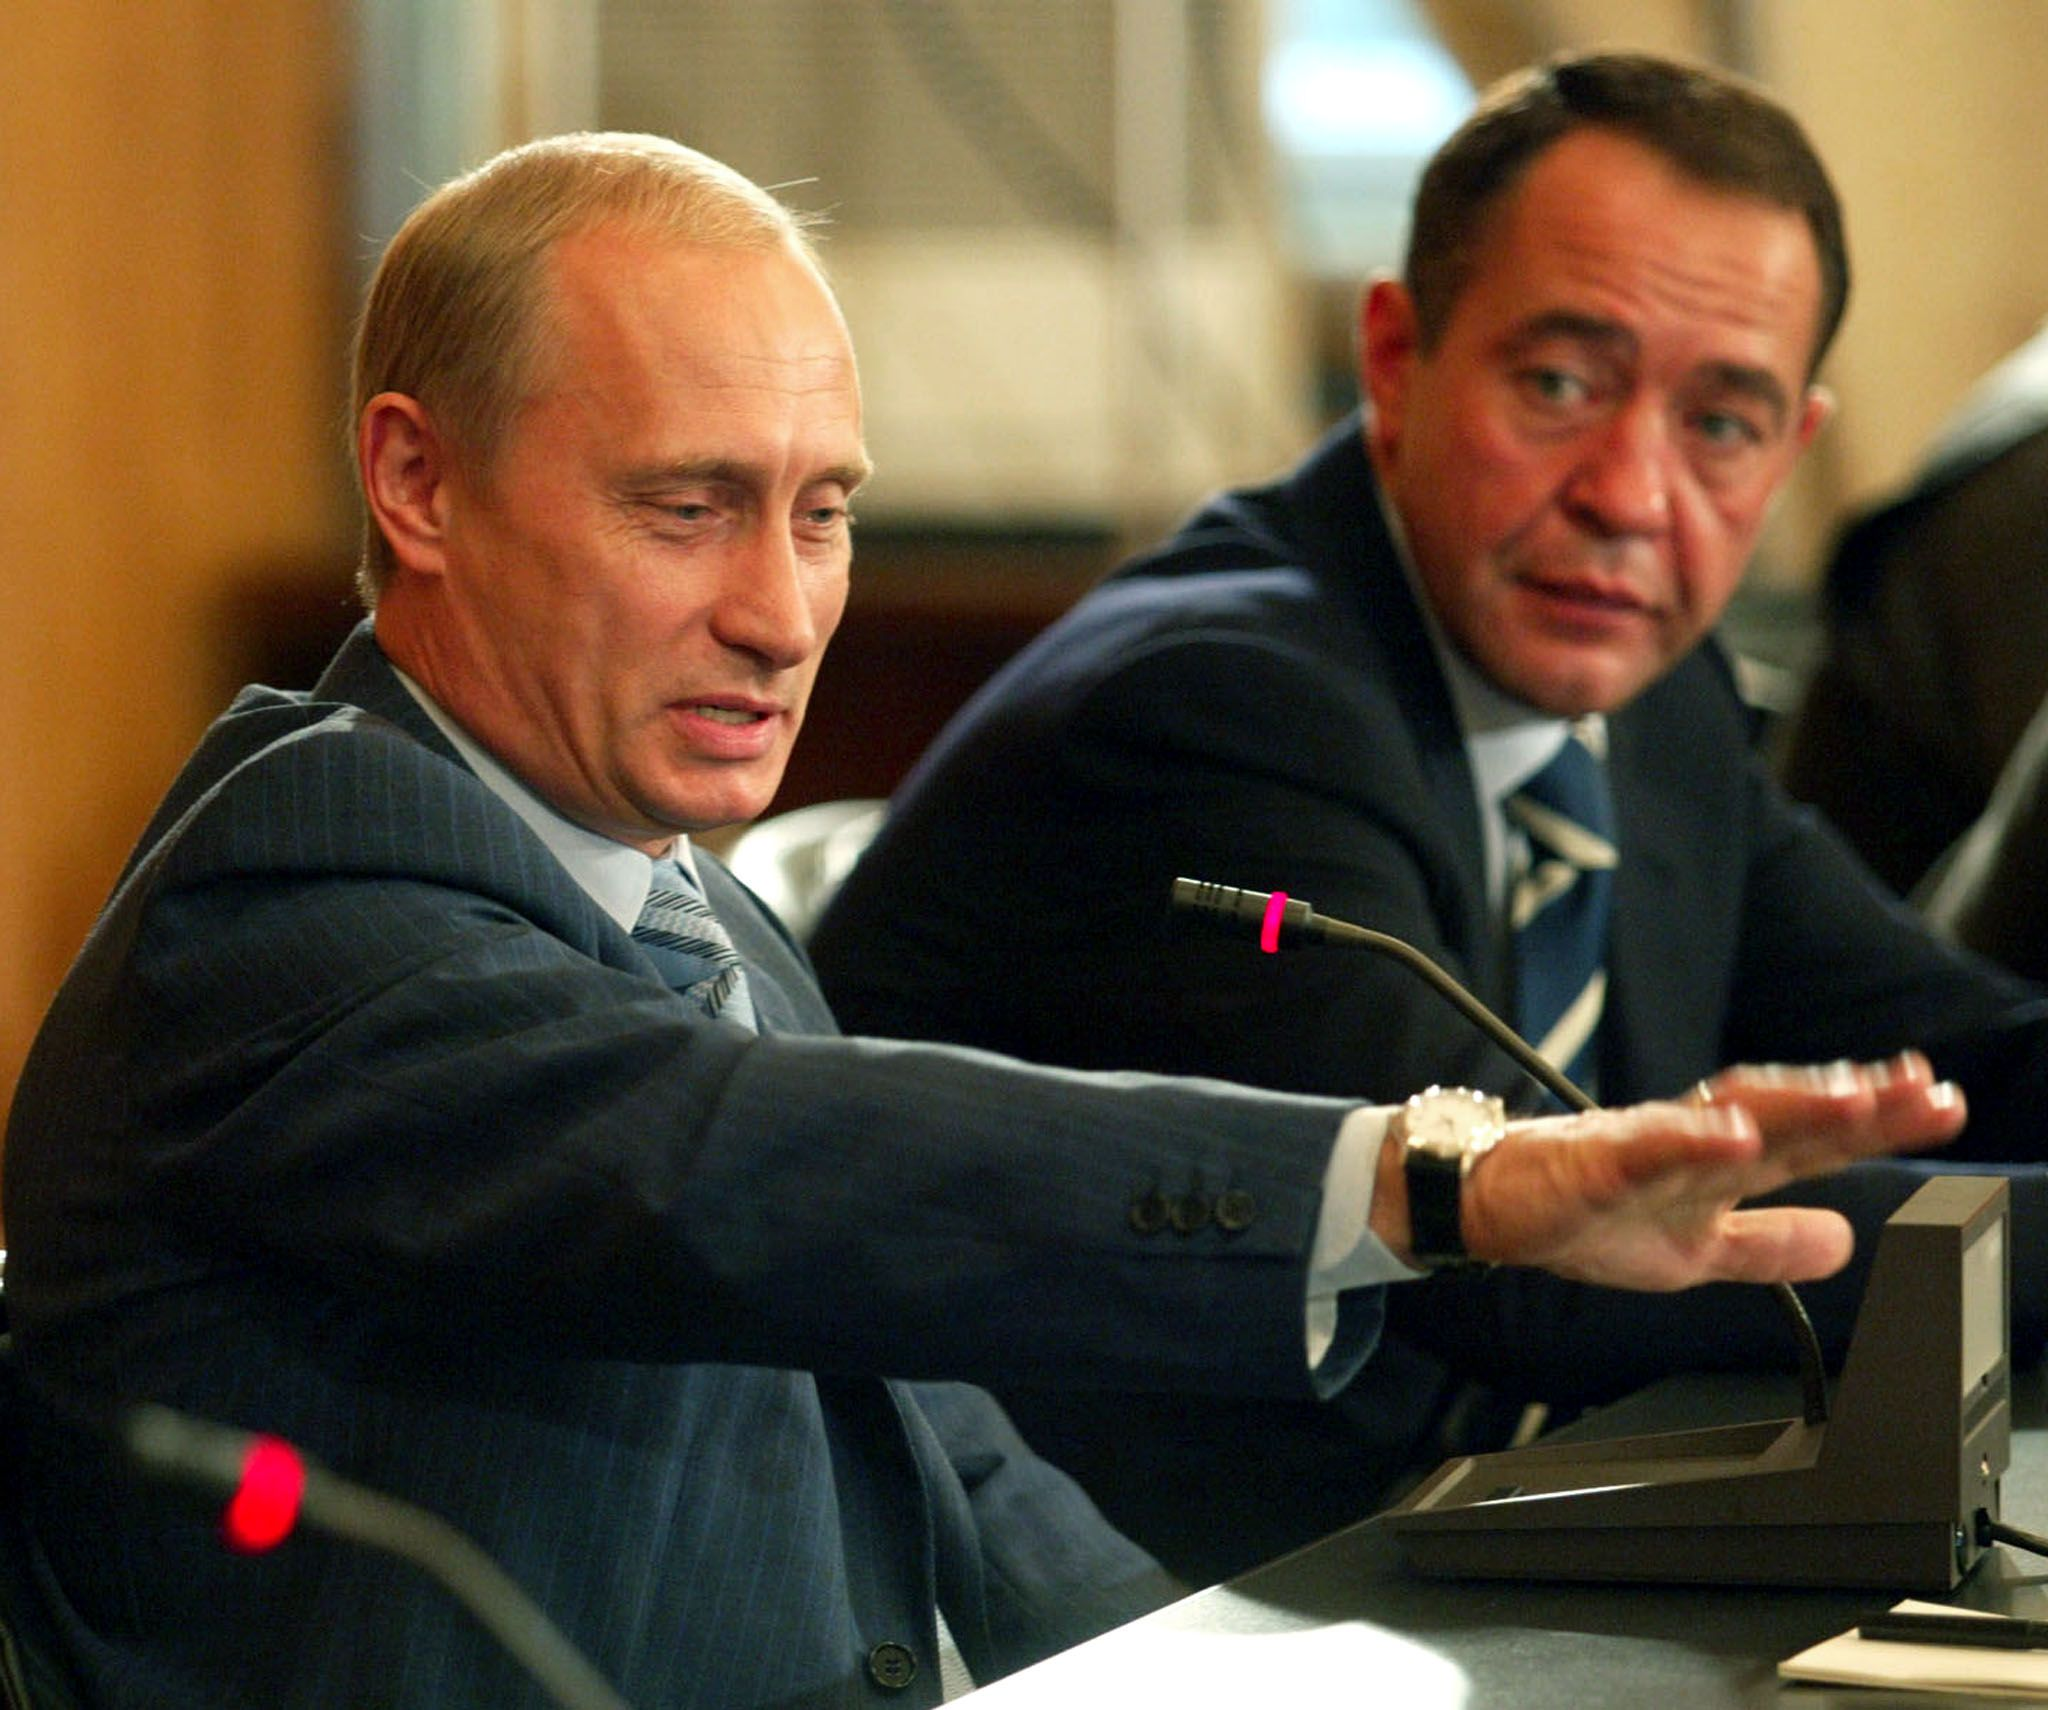 Putin and Lesin